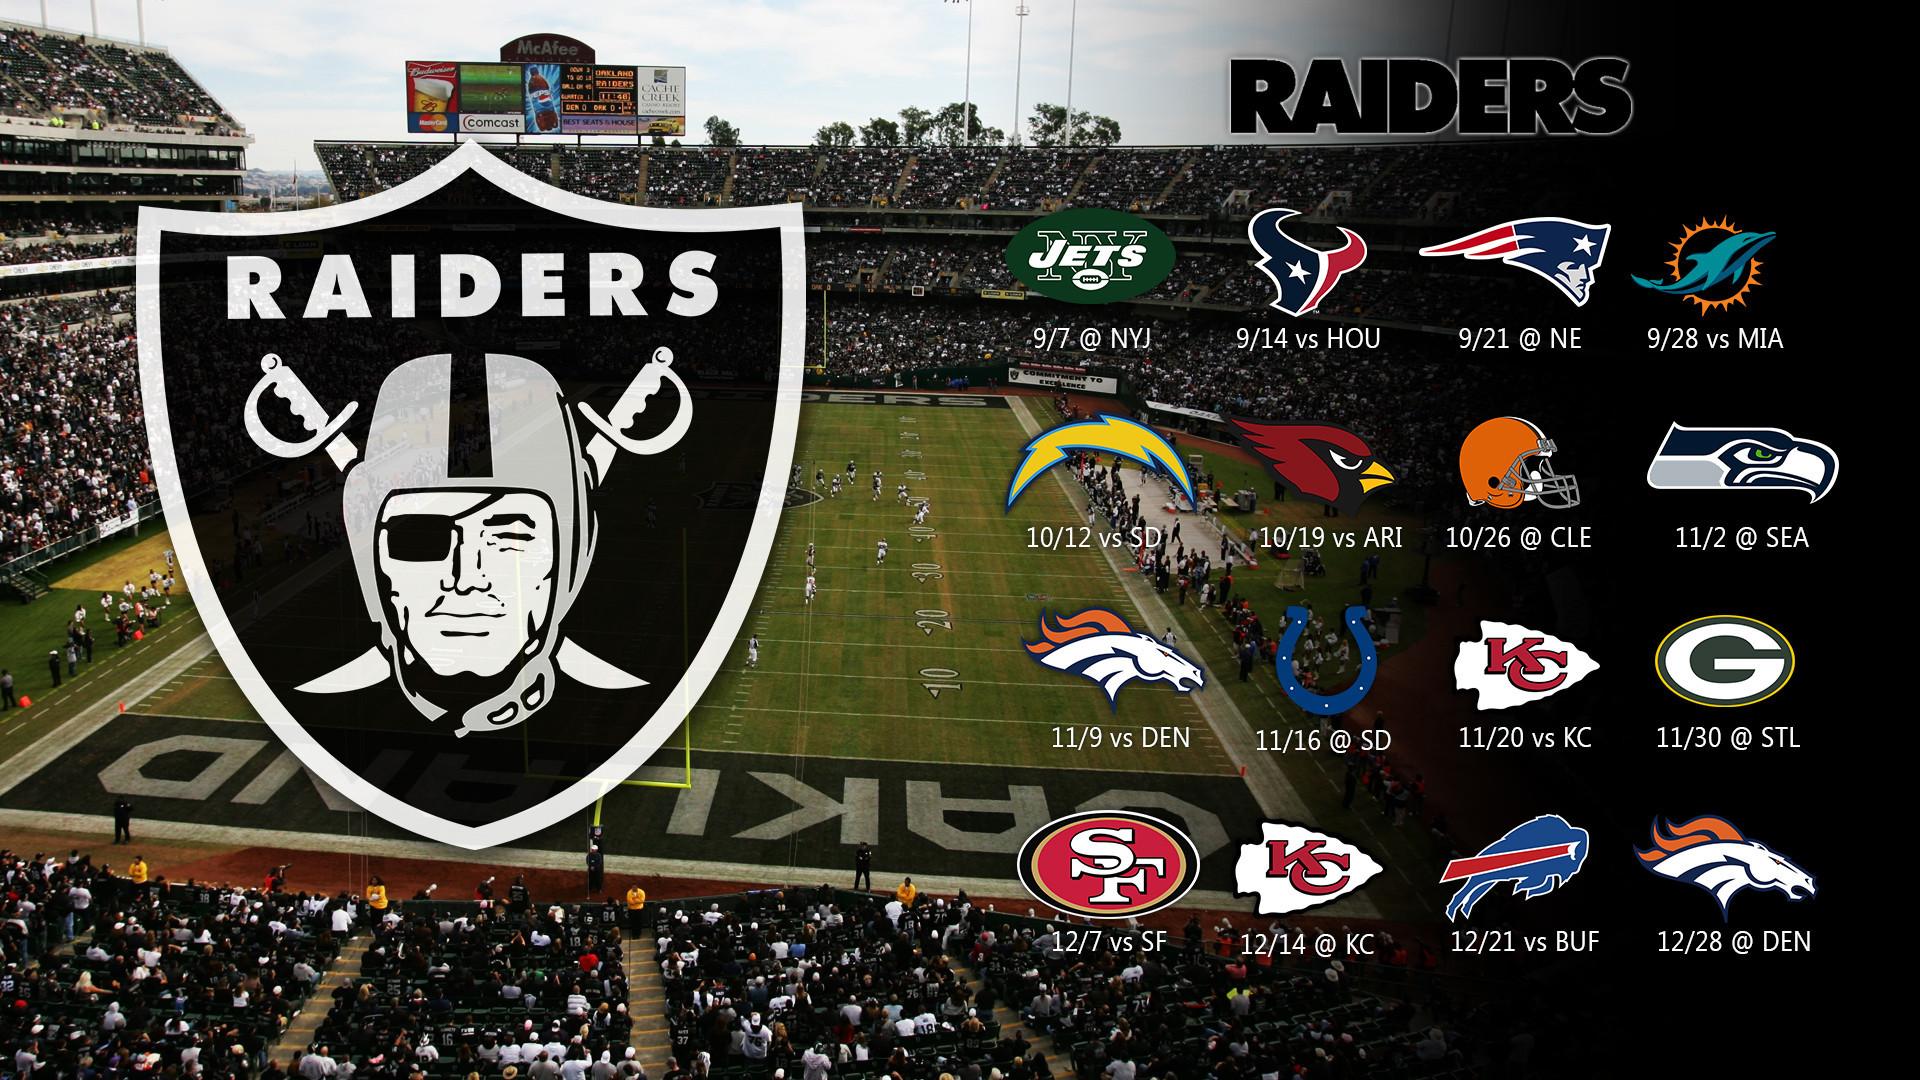 Raiders 2018 Wallpaper ·①